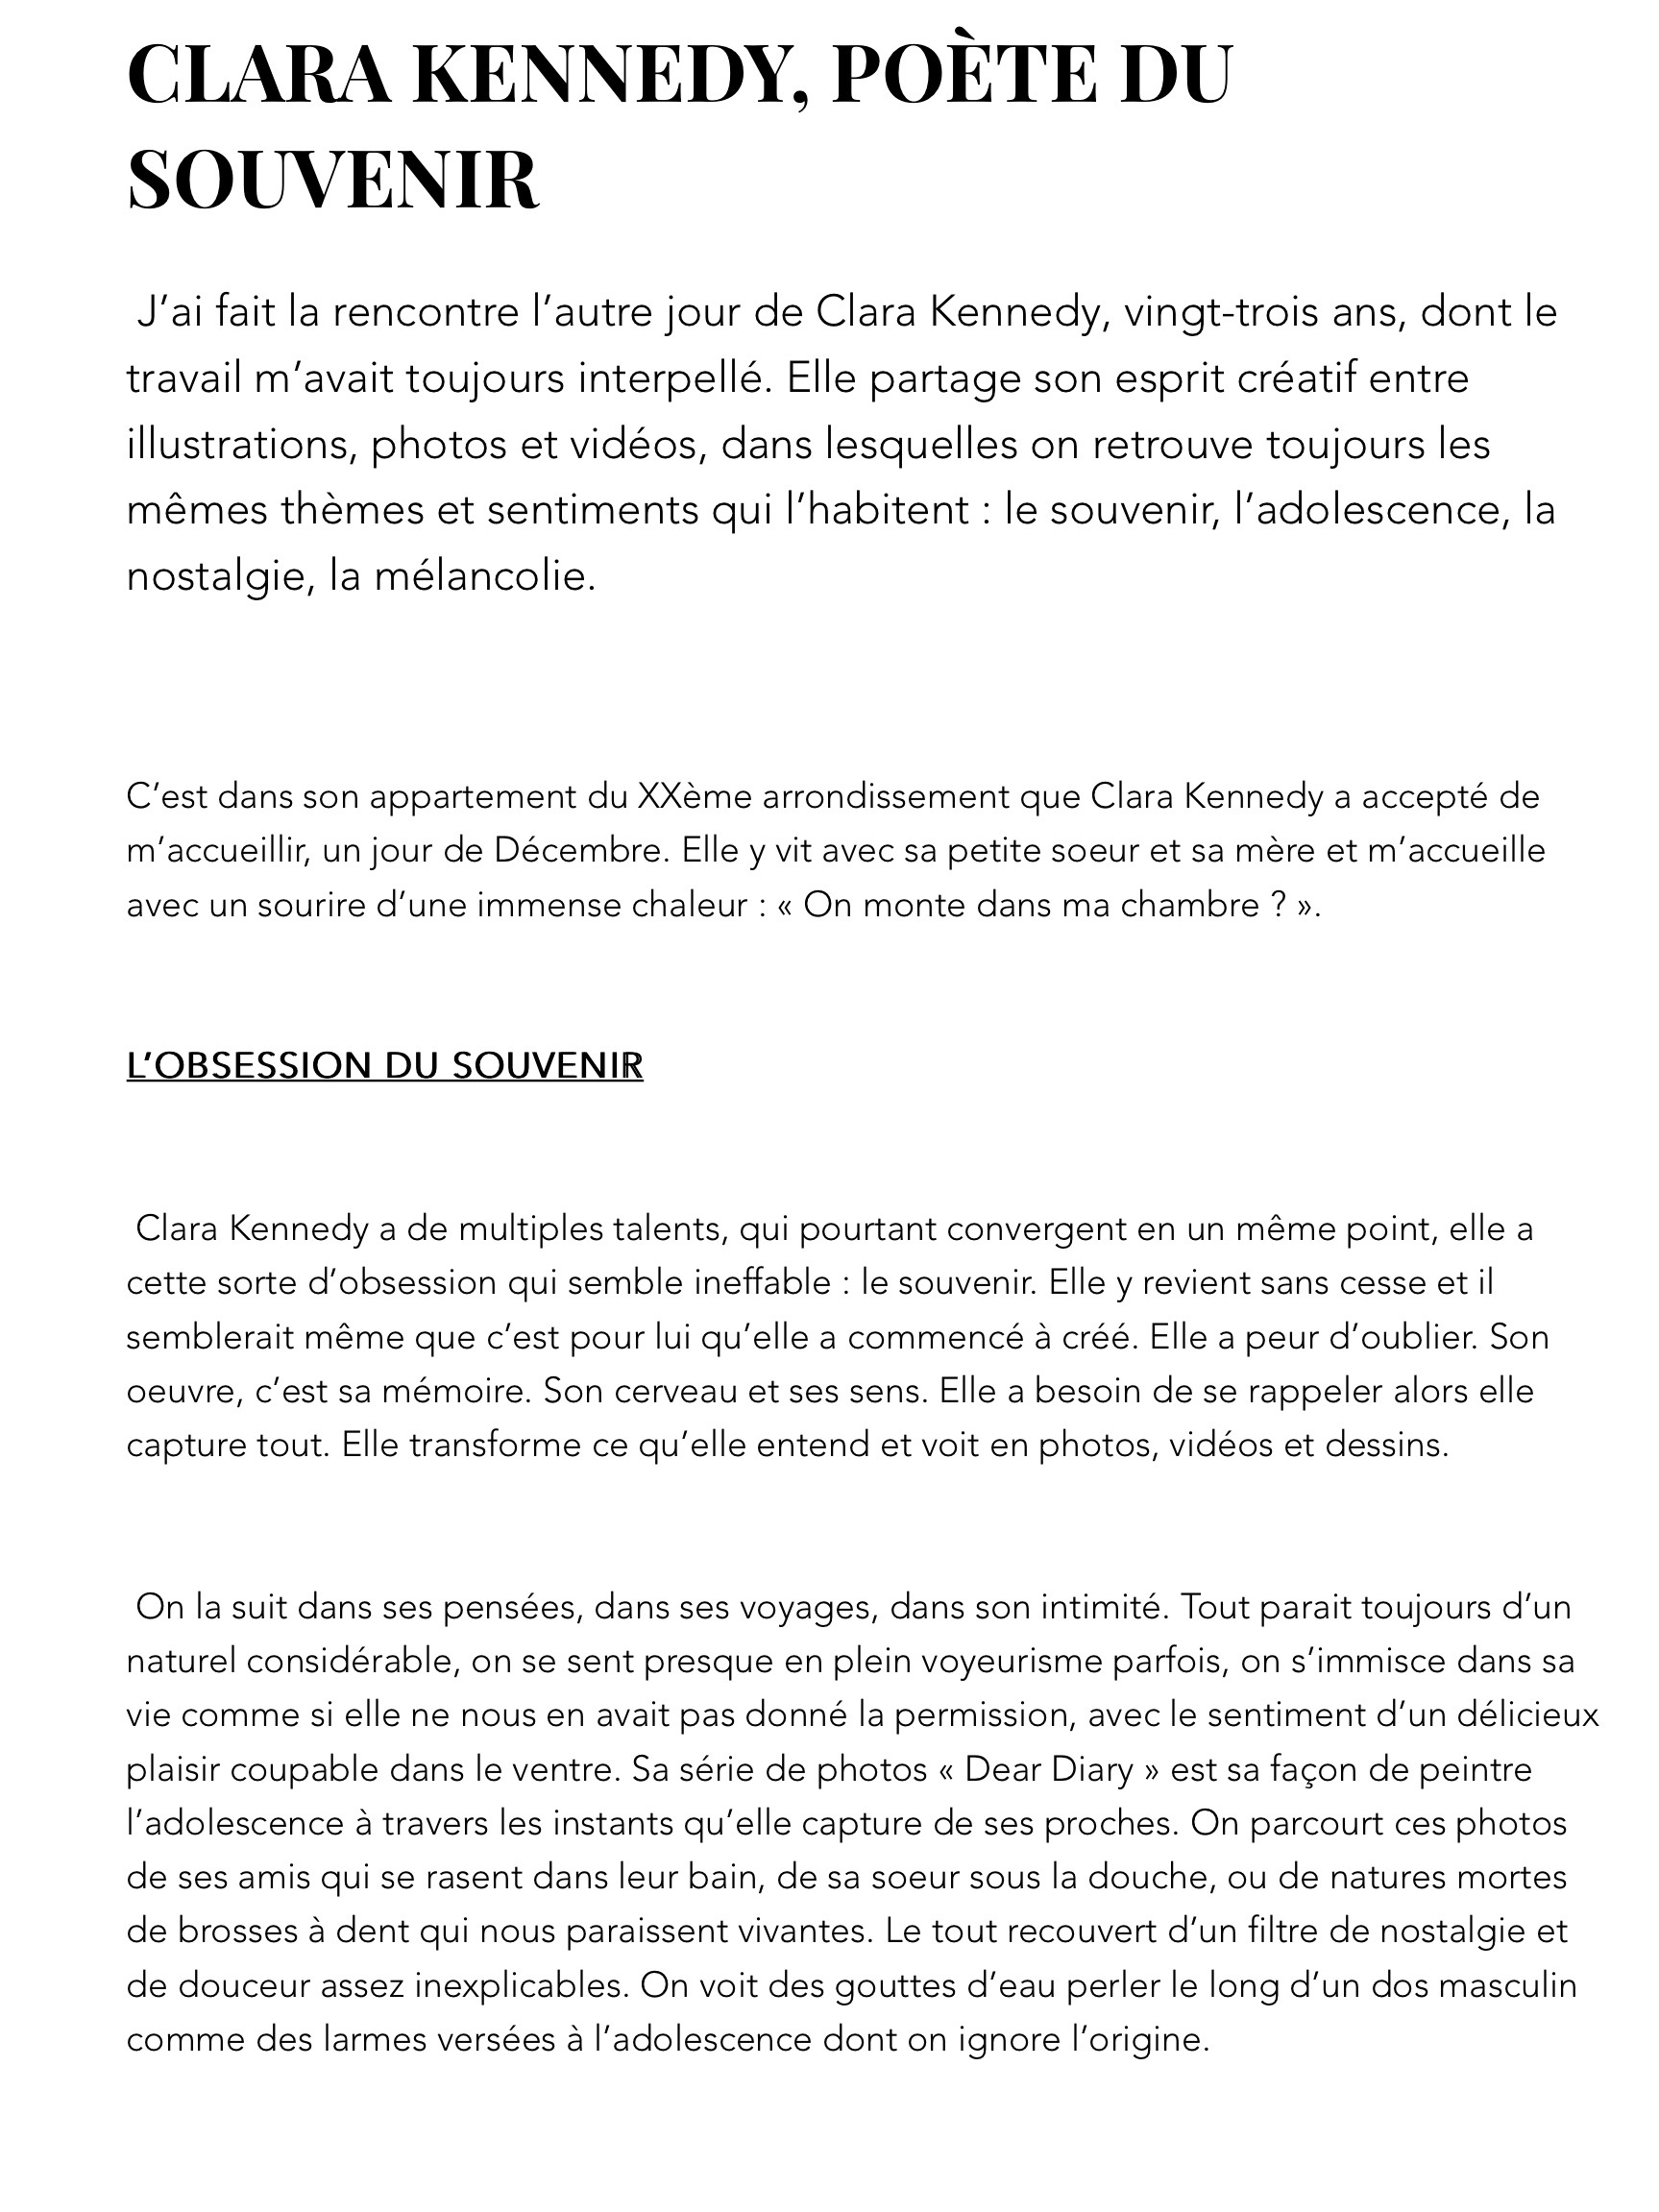 CLARA KENNEDY, POÈTE DU SOUVENIR copie 2